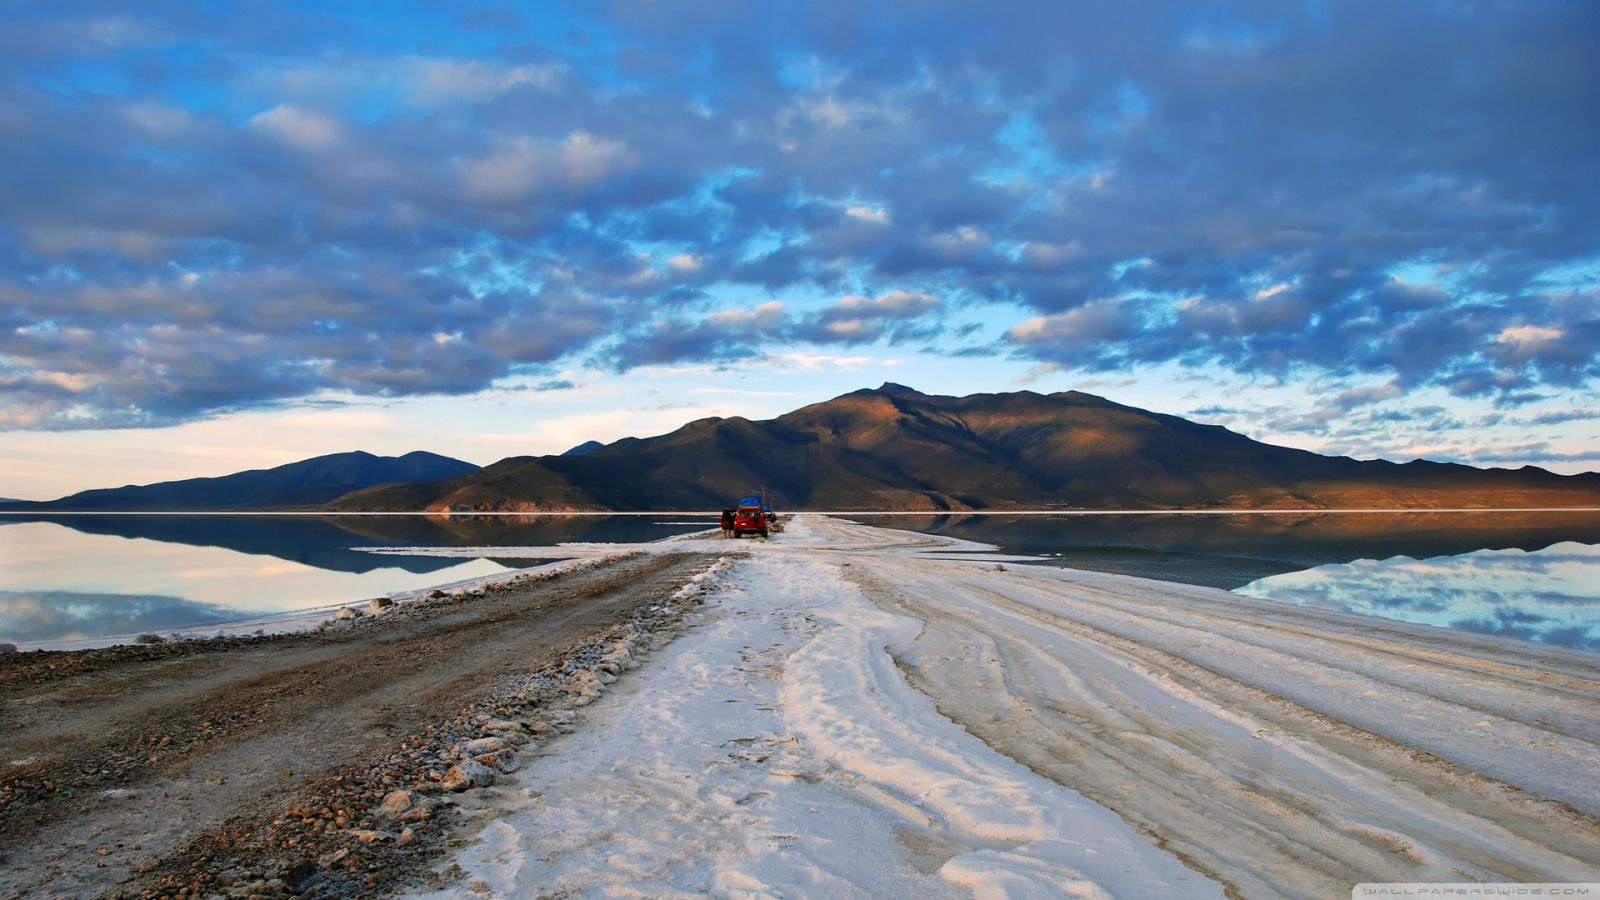 Salar De Uyuni Salt Desert Bolivia 4K HD Desktop Wallpaper for 1600x900